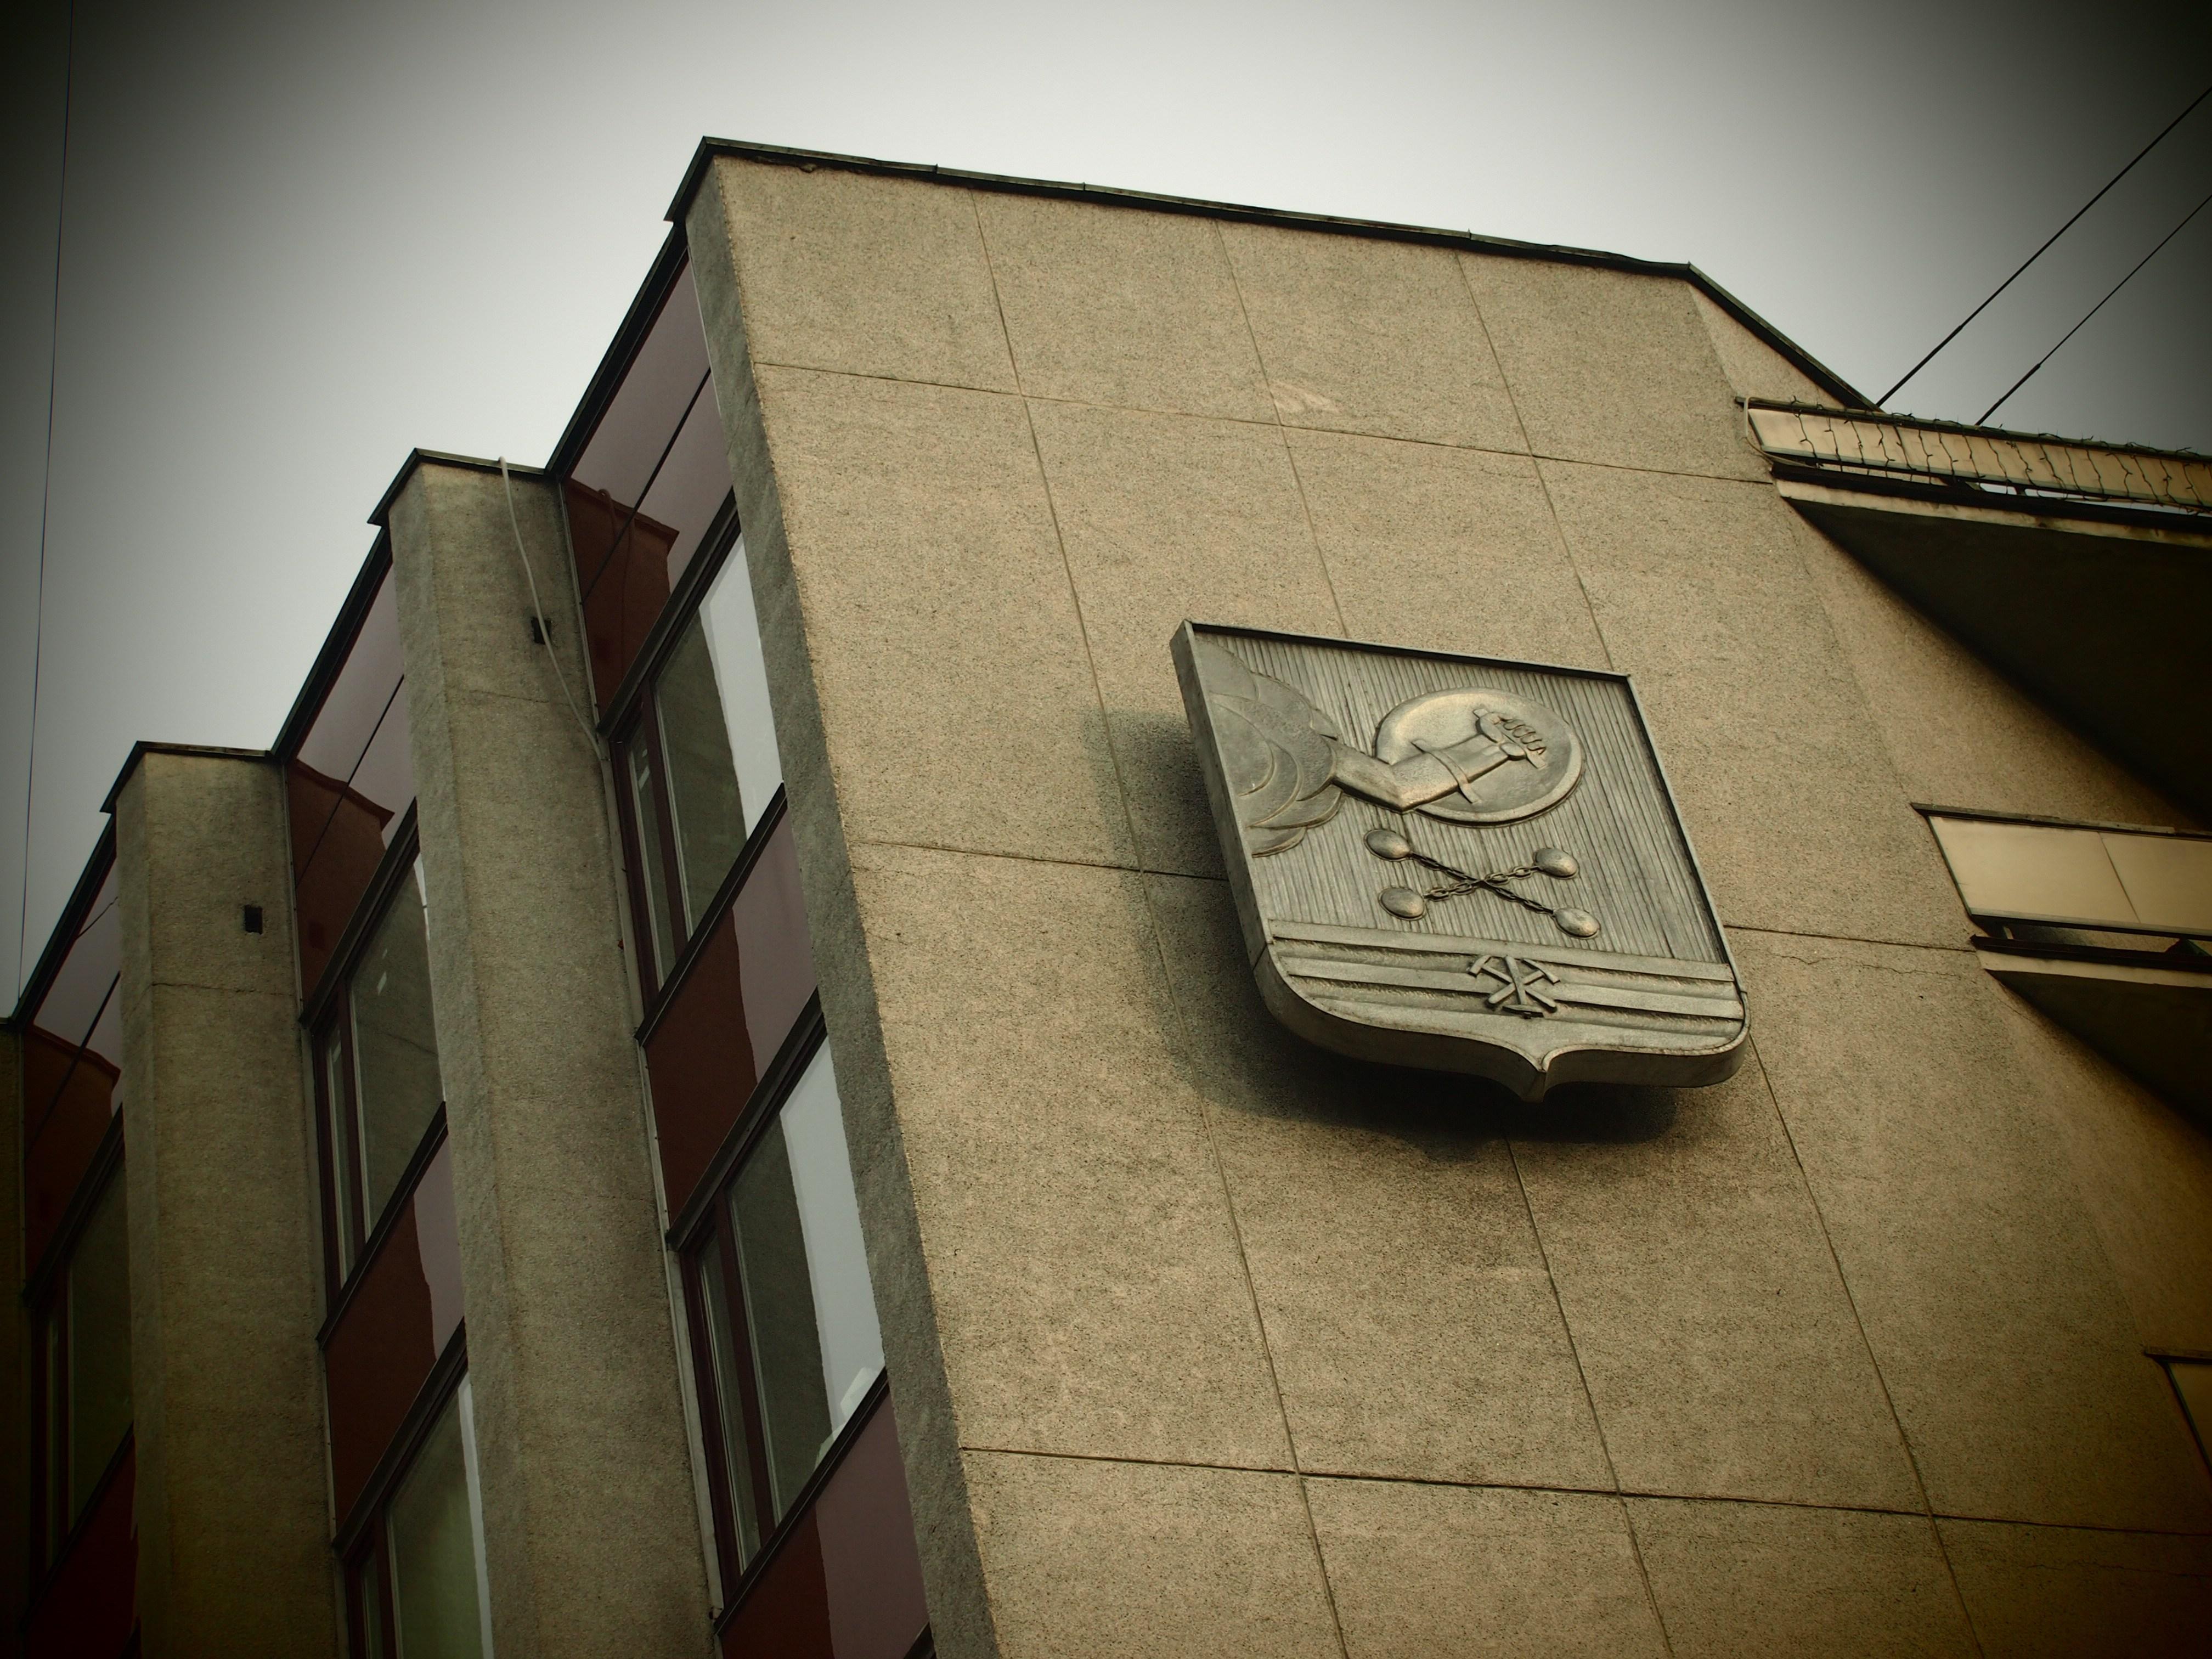 Кто станет сити-менеджером Петрозаводска, решают не в мэрии? Фото: Валерий Поташов